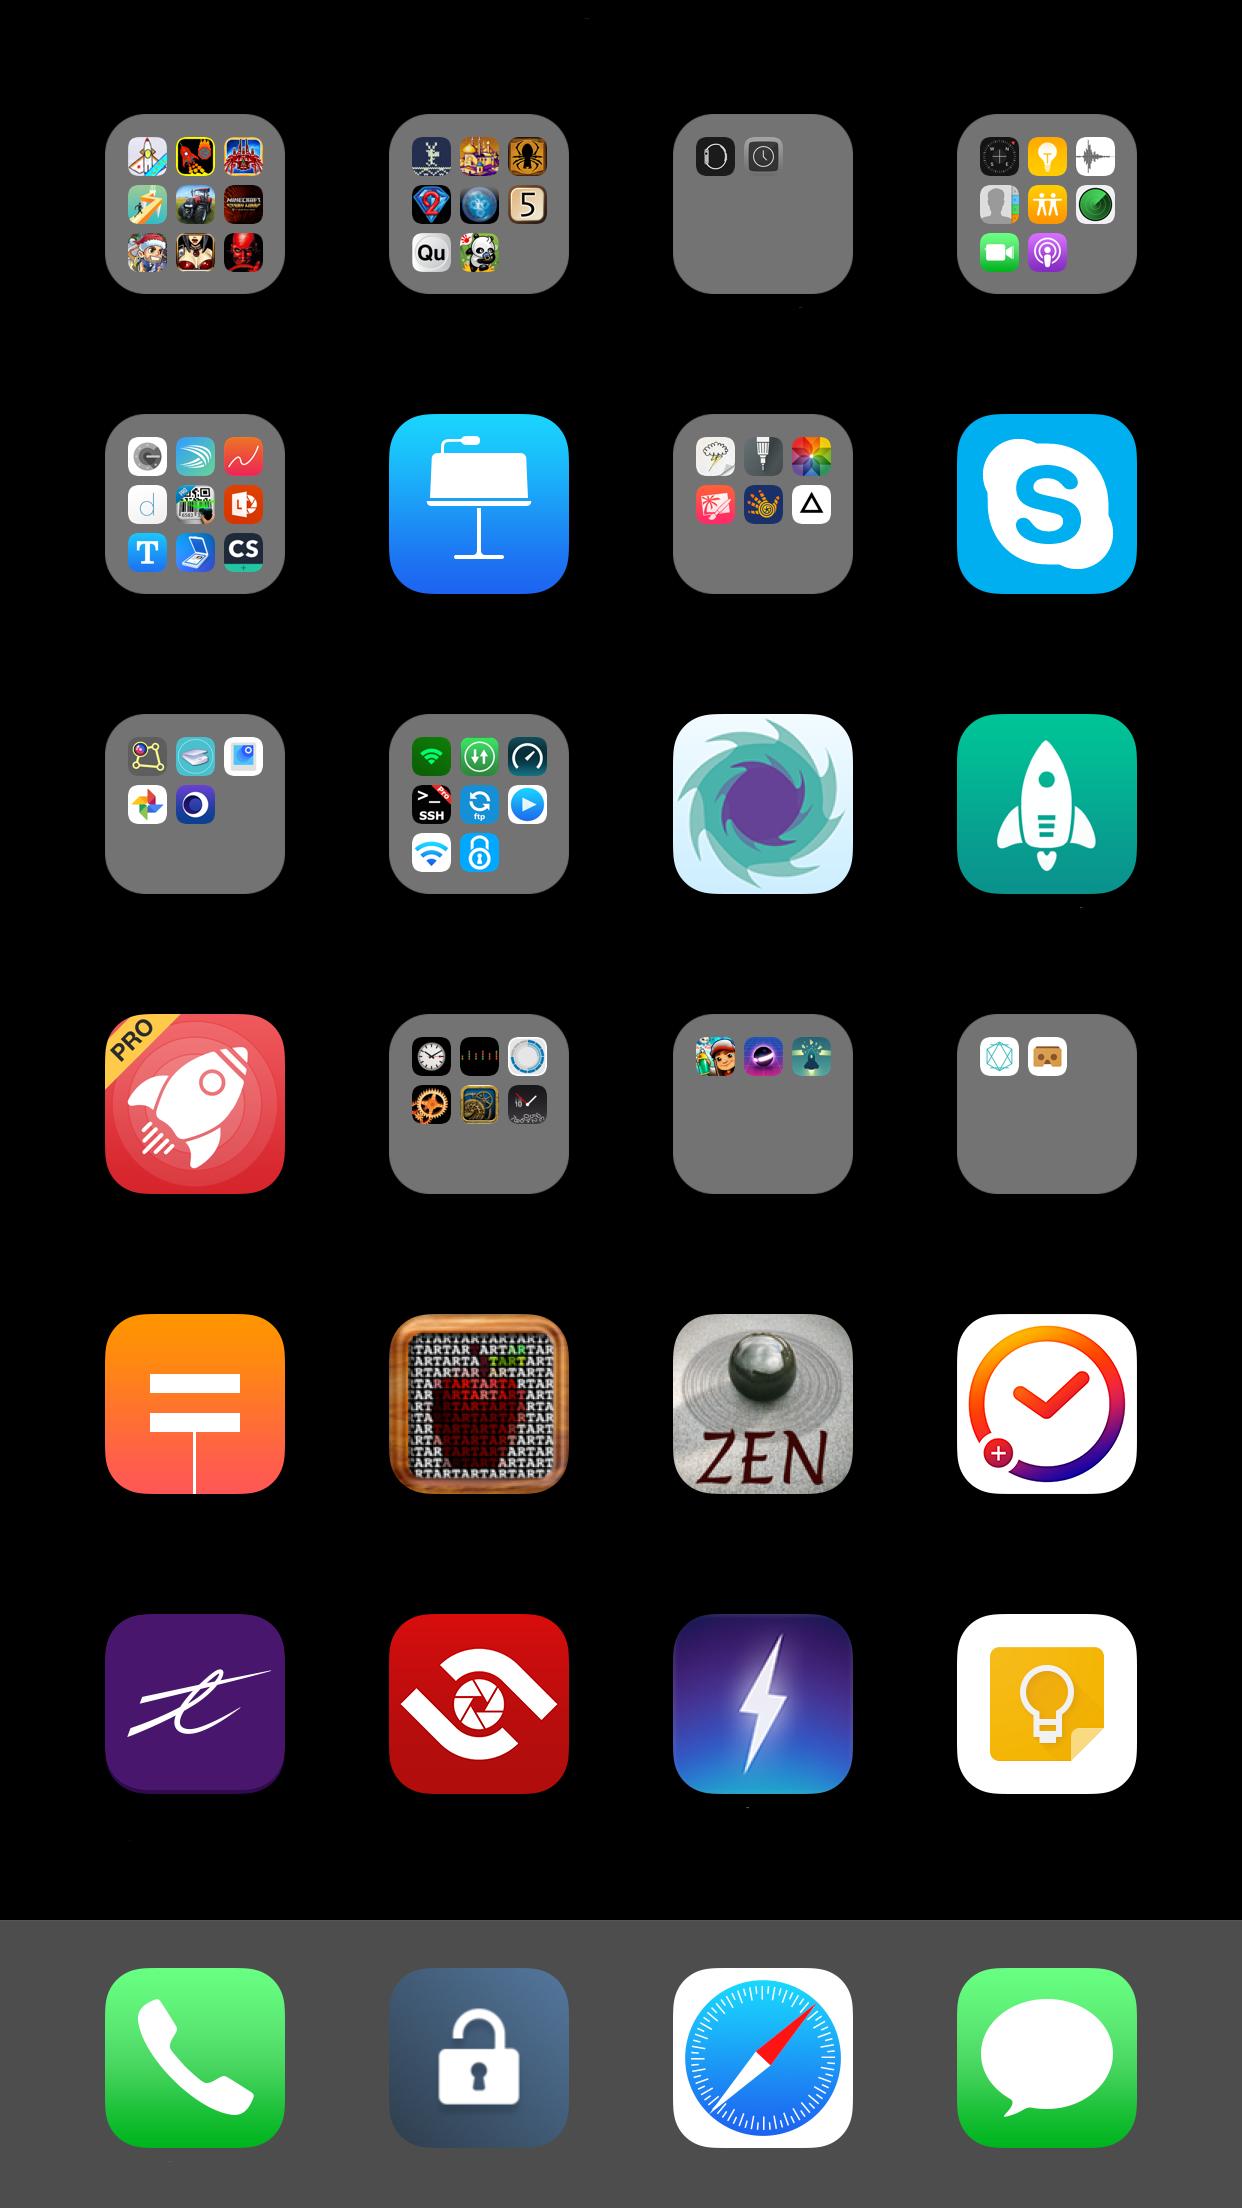 iPhone 7 Plus wallpaper creation MacRumors Forums 1242x2208